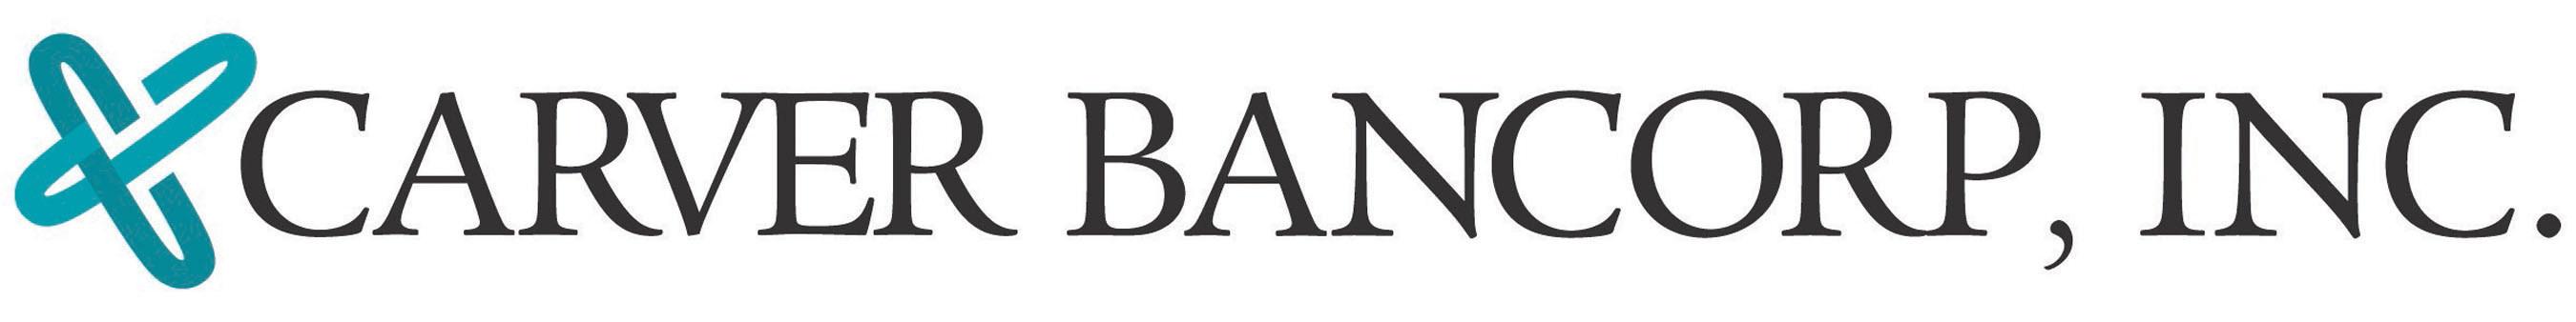 Carver_Bancorp_Logo.jpg?p=publish&width=750